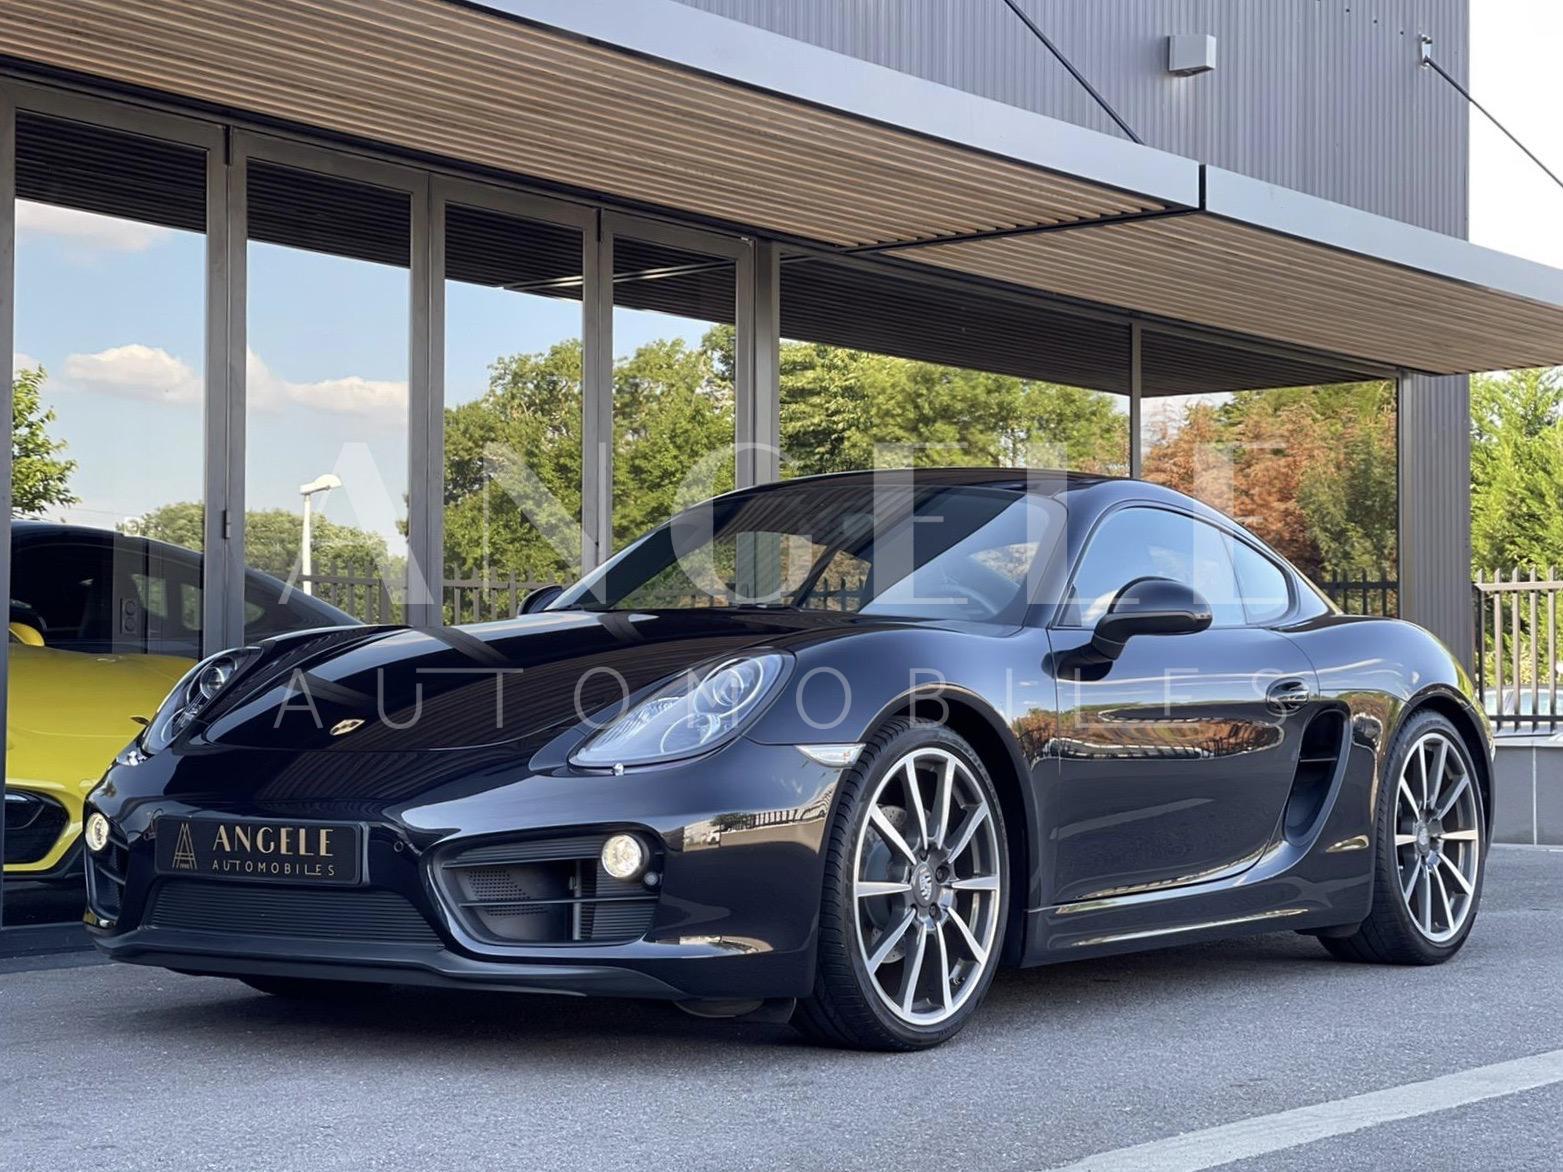 Porsche Cayman Black edition - ANGELE AUTOMOBILES